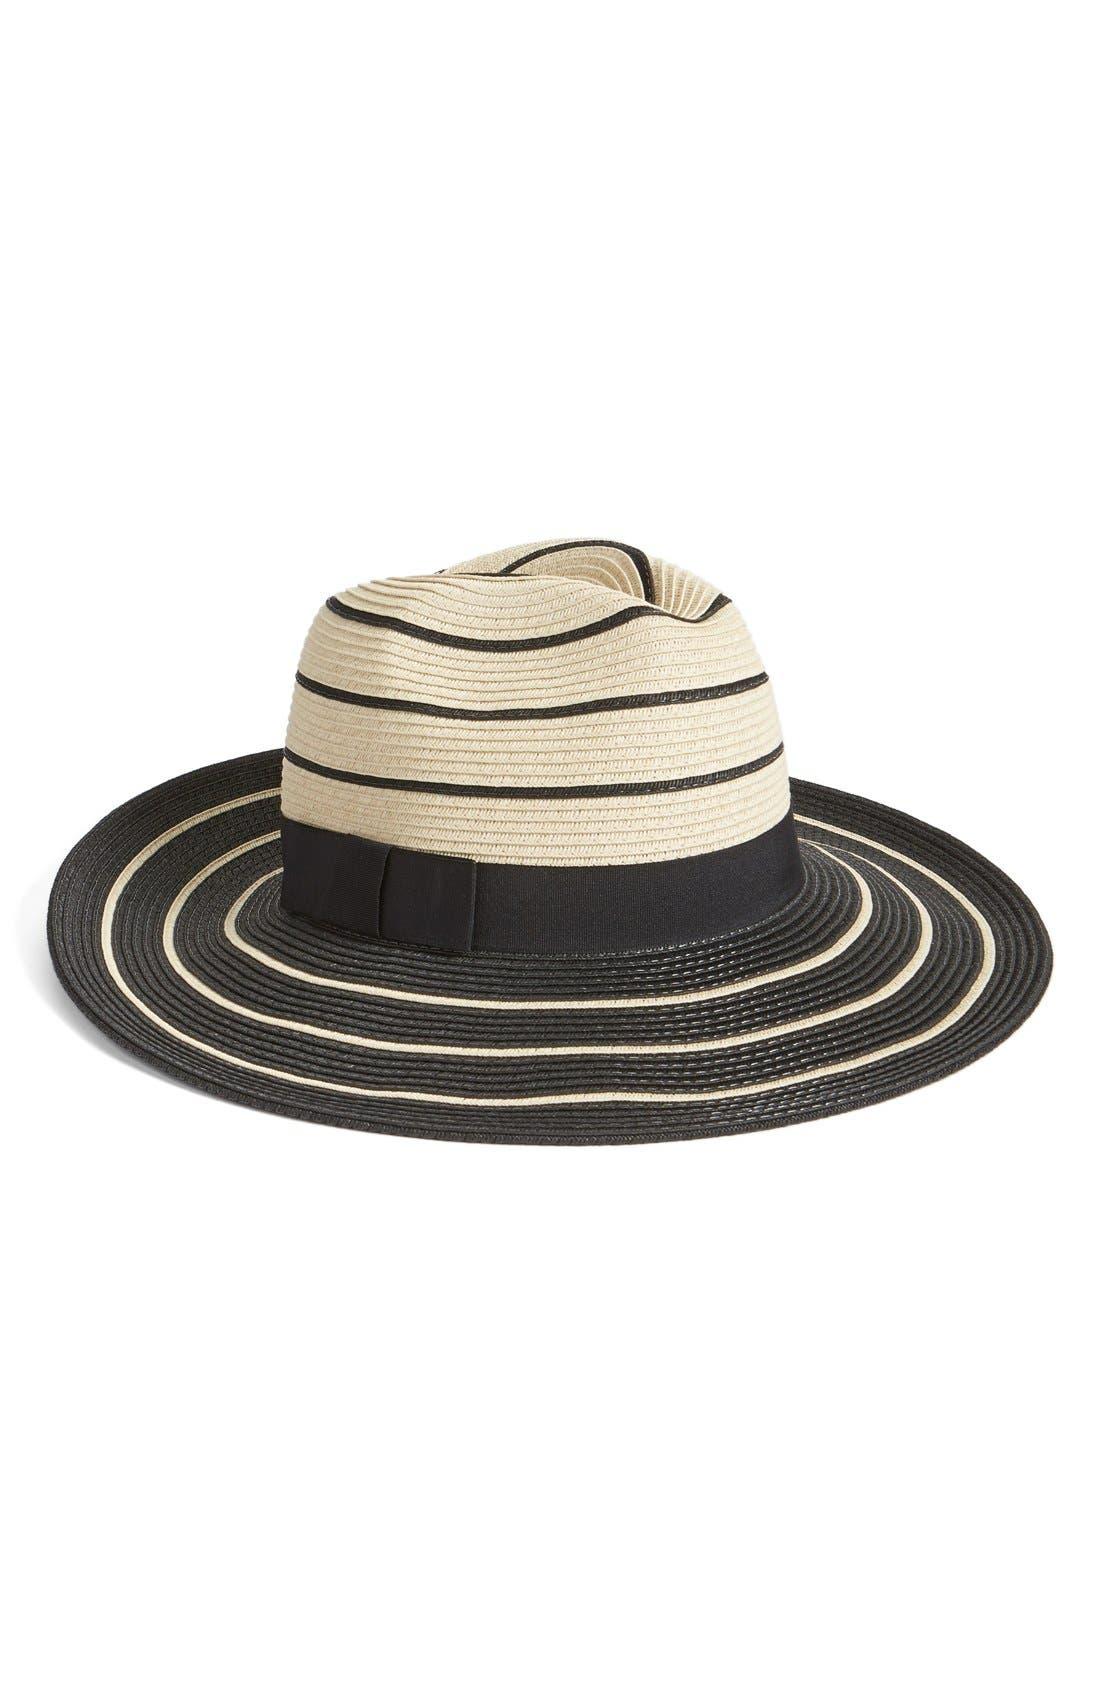 Main Image - Halogen Striped Panama Hat